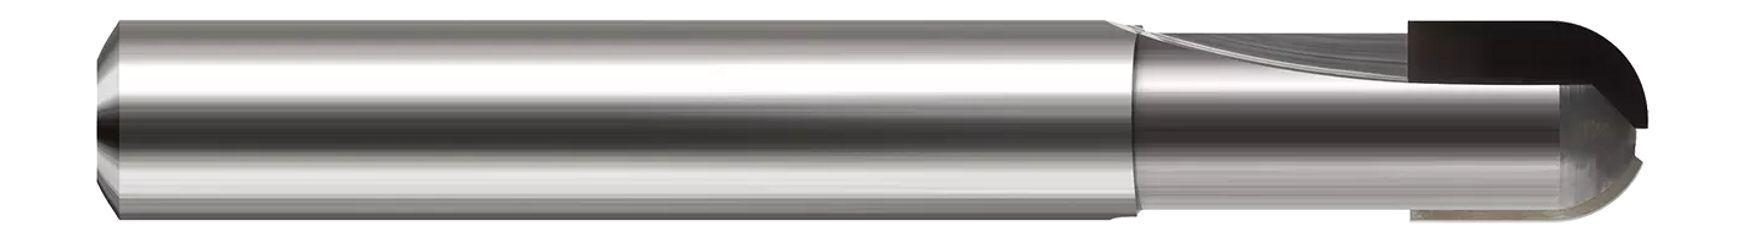 Diamond End Mills for Non-Ferrous Materials - PCD Diamond - Ball